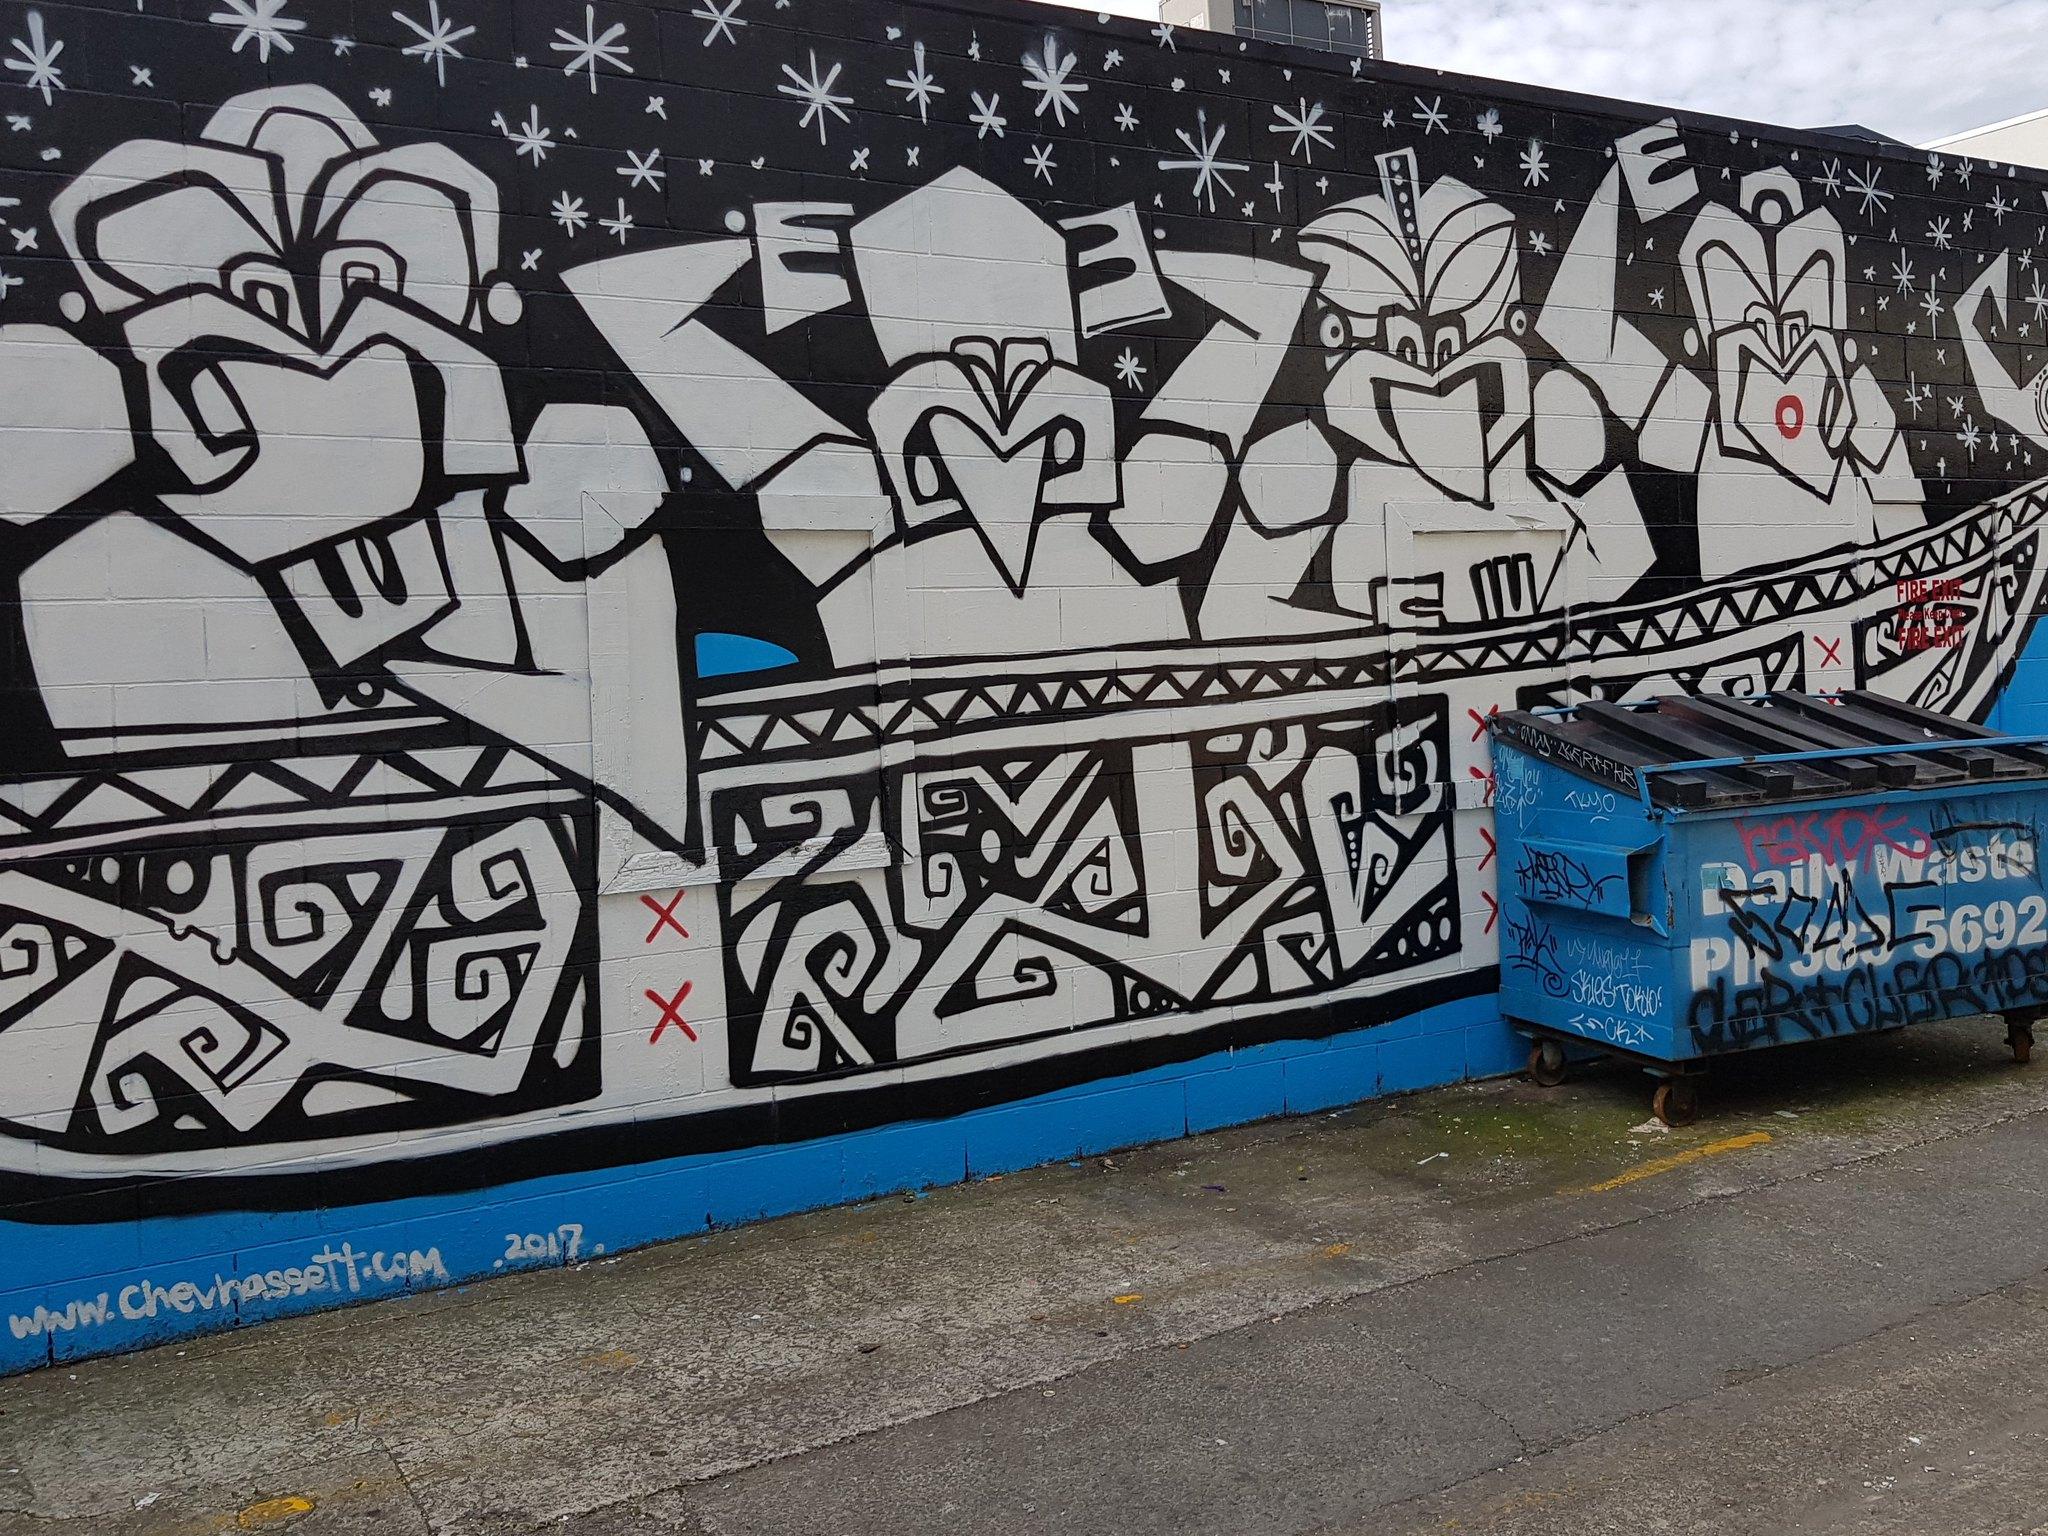 20181130_172312 (Urban cammo)